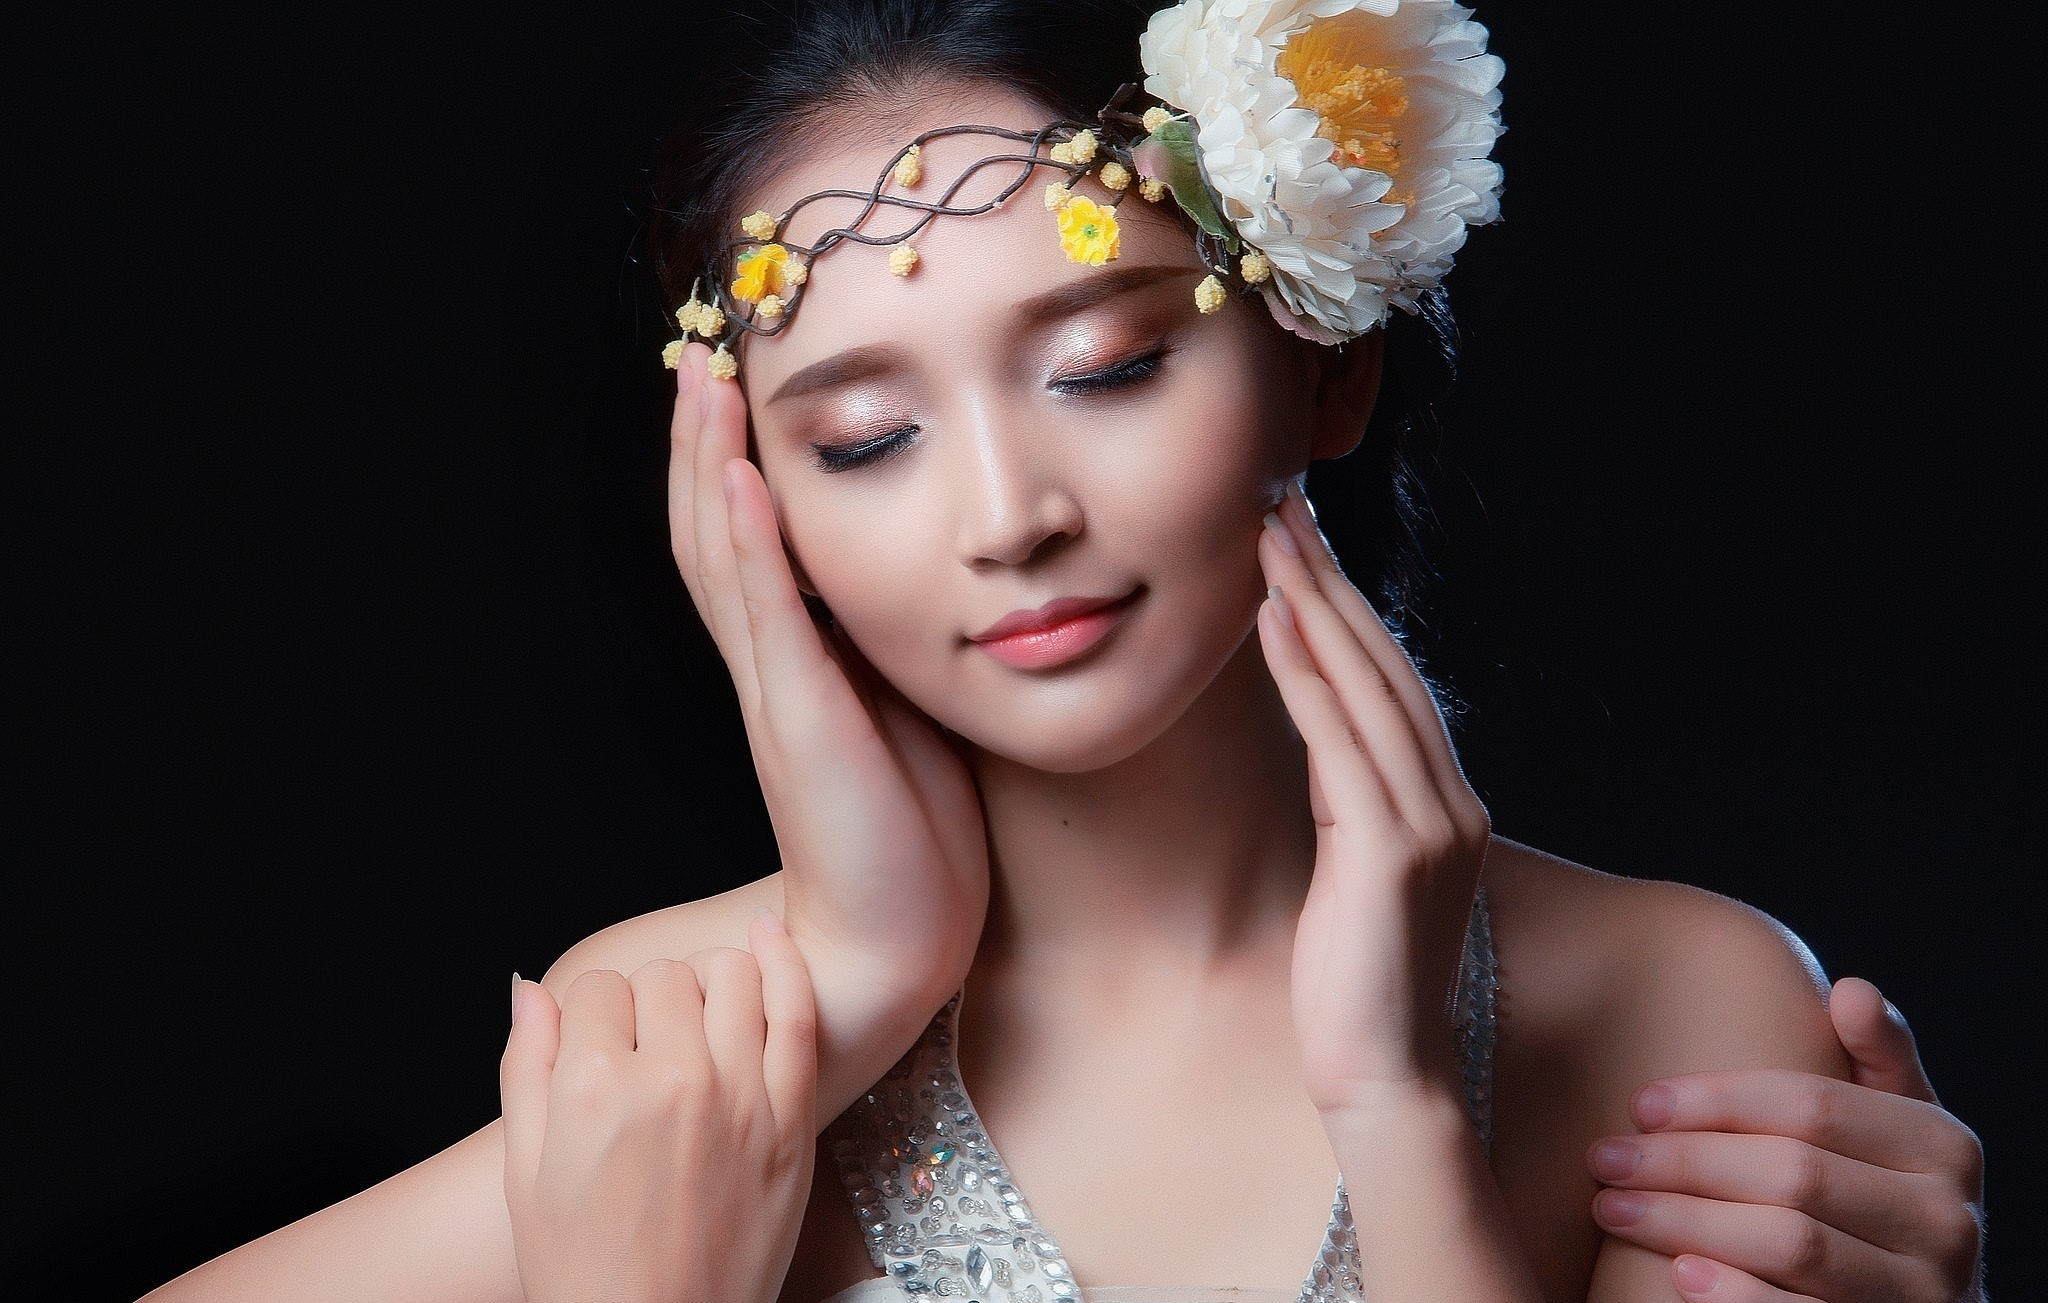 Wallpaper face women model flowers Asian dress fashion 2048x1303